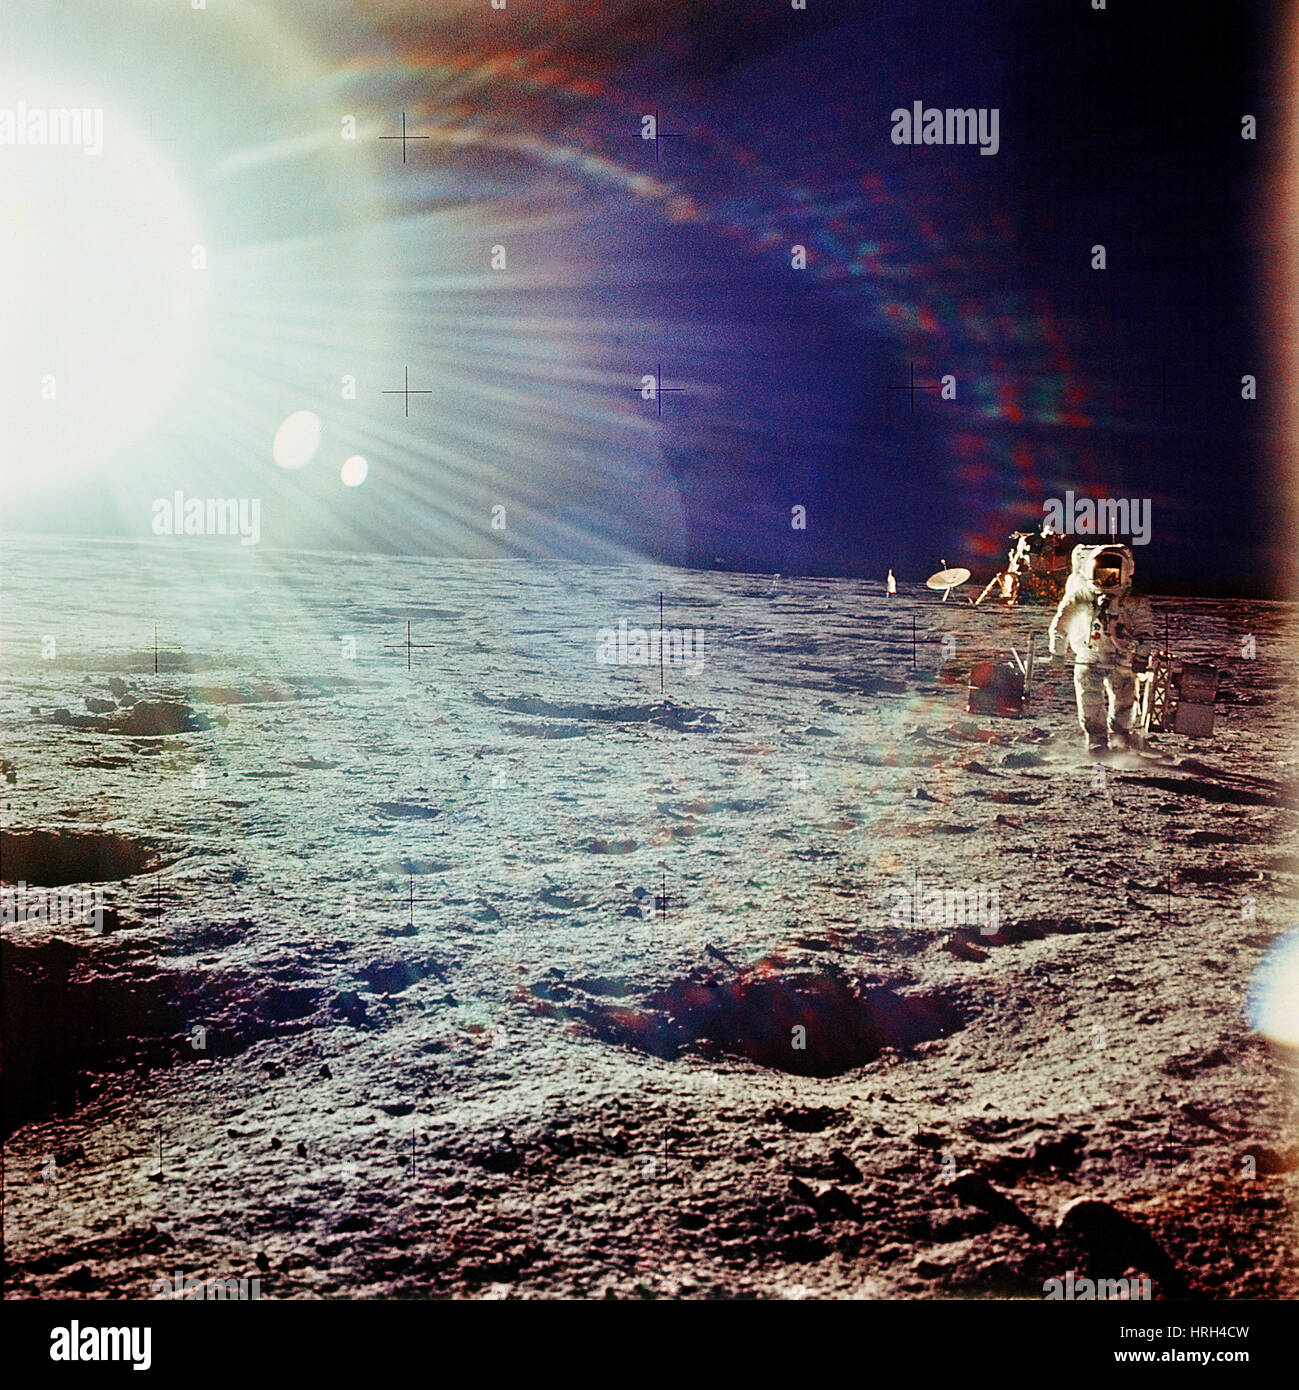 Apollo 12 astronaut - Stock Image